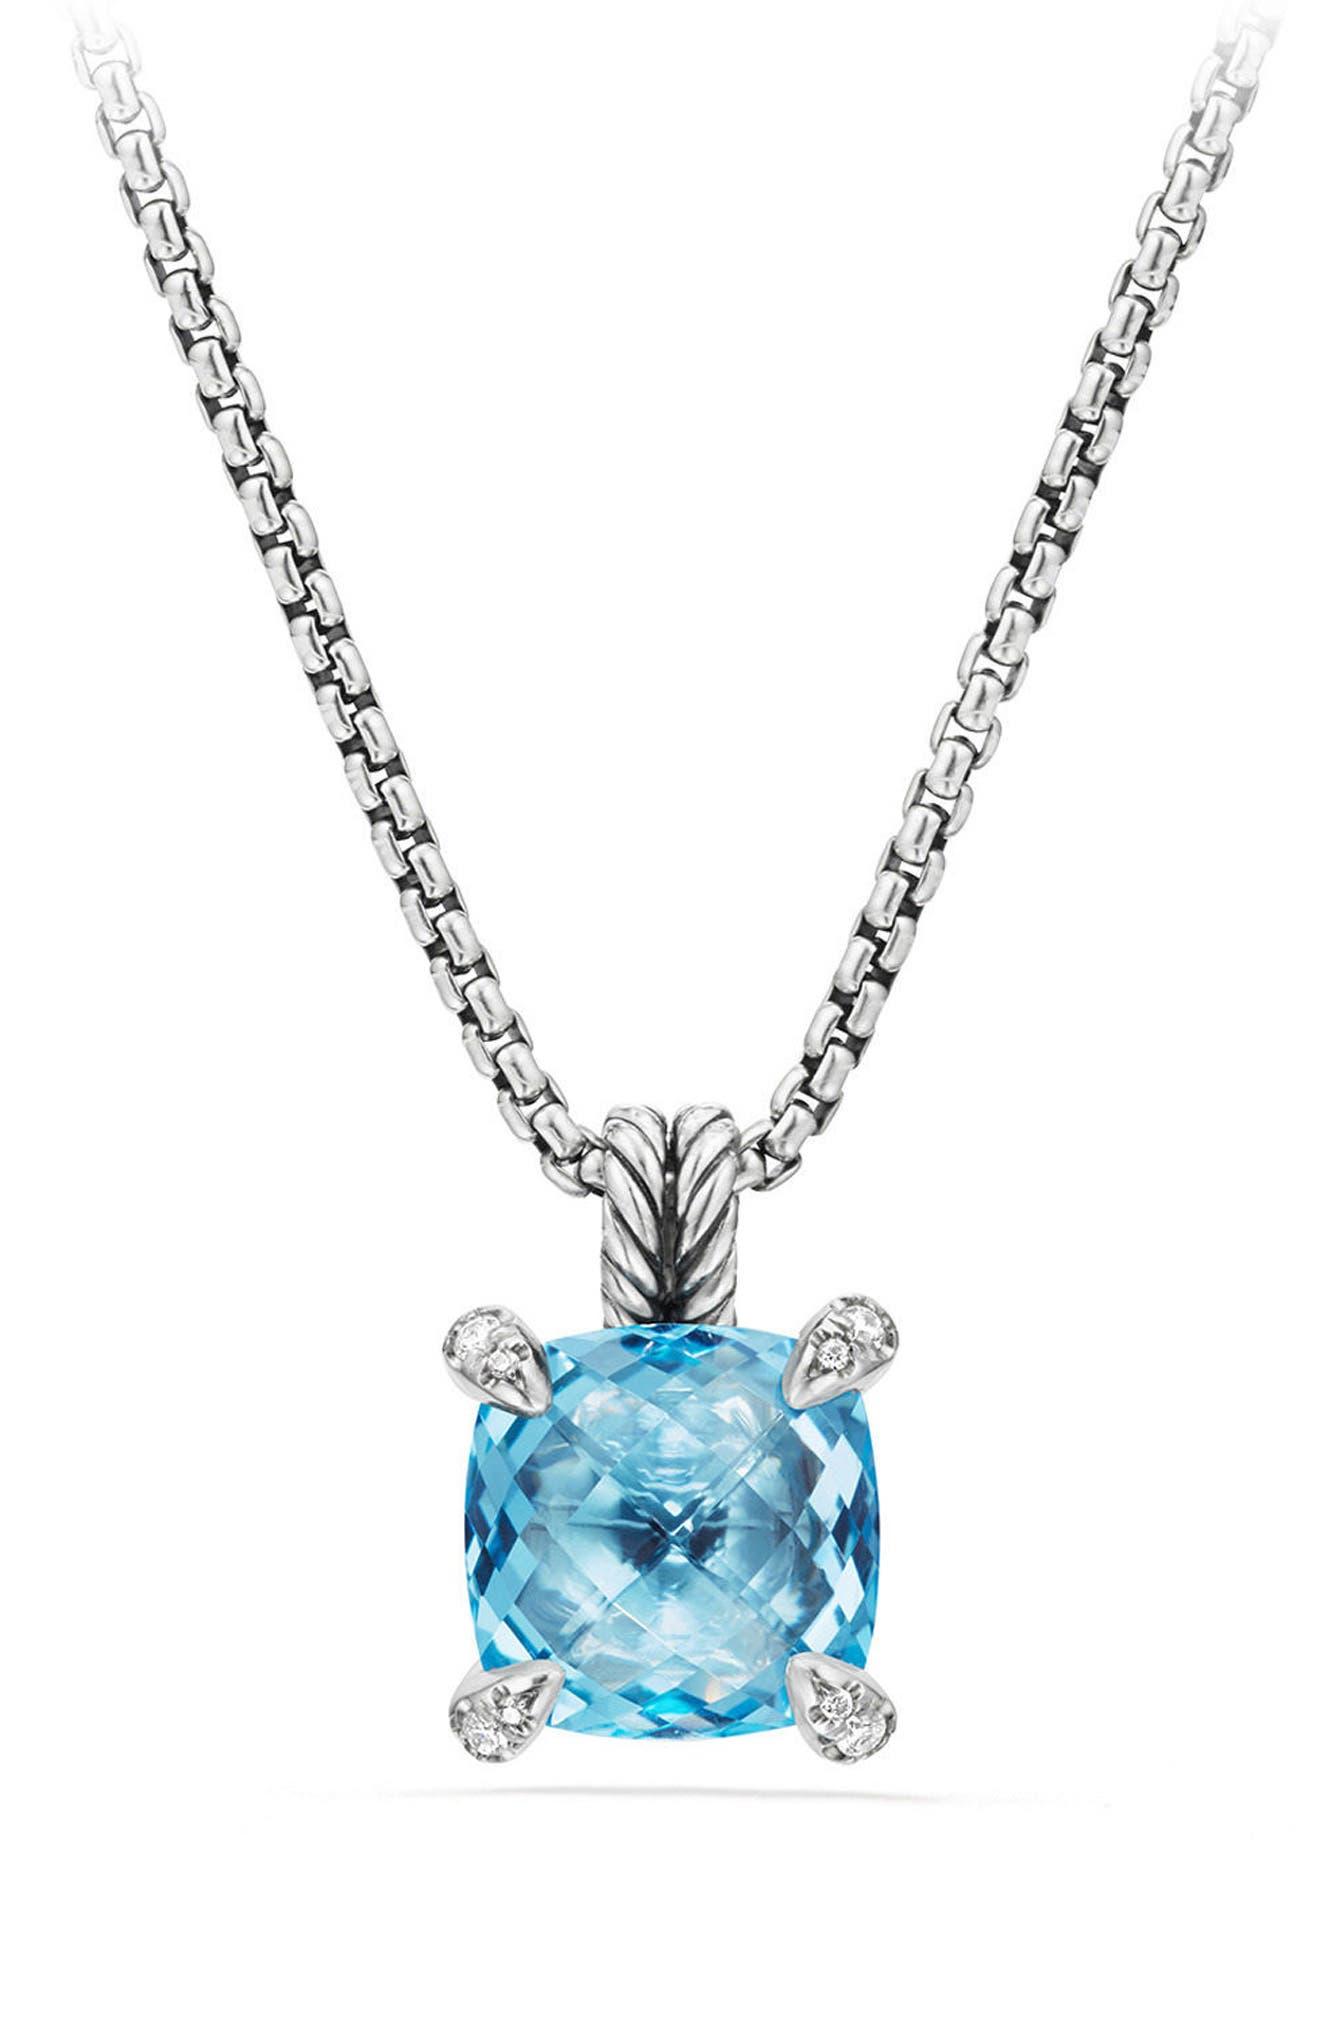 Châtelaine Pendant Necklace with Semiprecious Stone & Diamonds,                             Main thumbnail 1, color,                             BLUE TOPAZ?